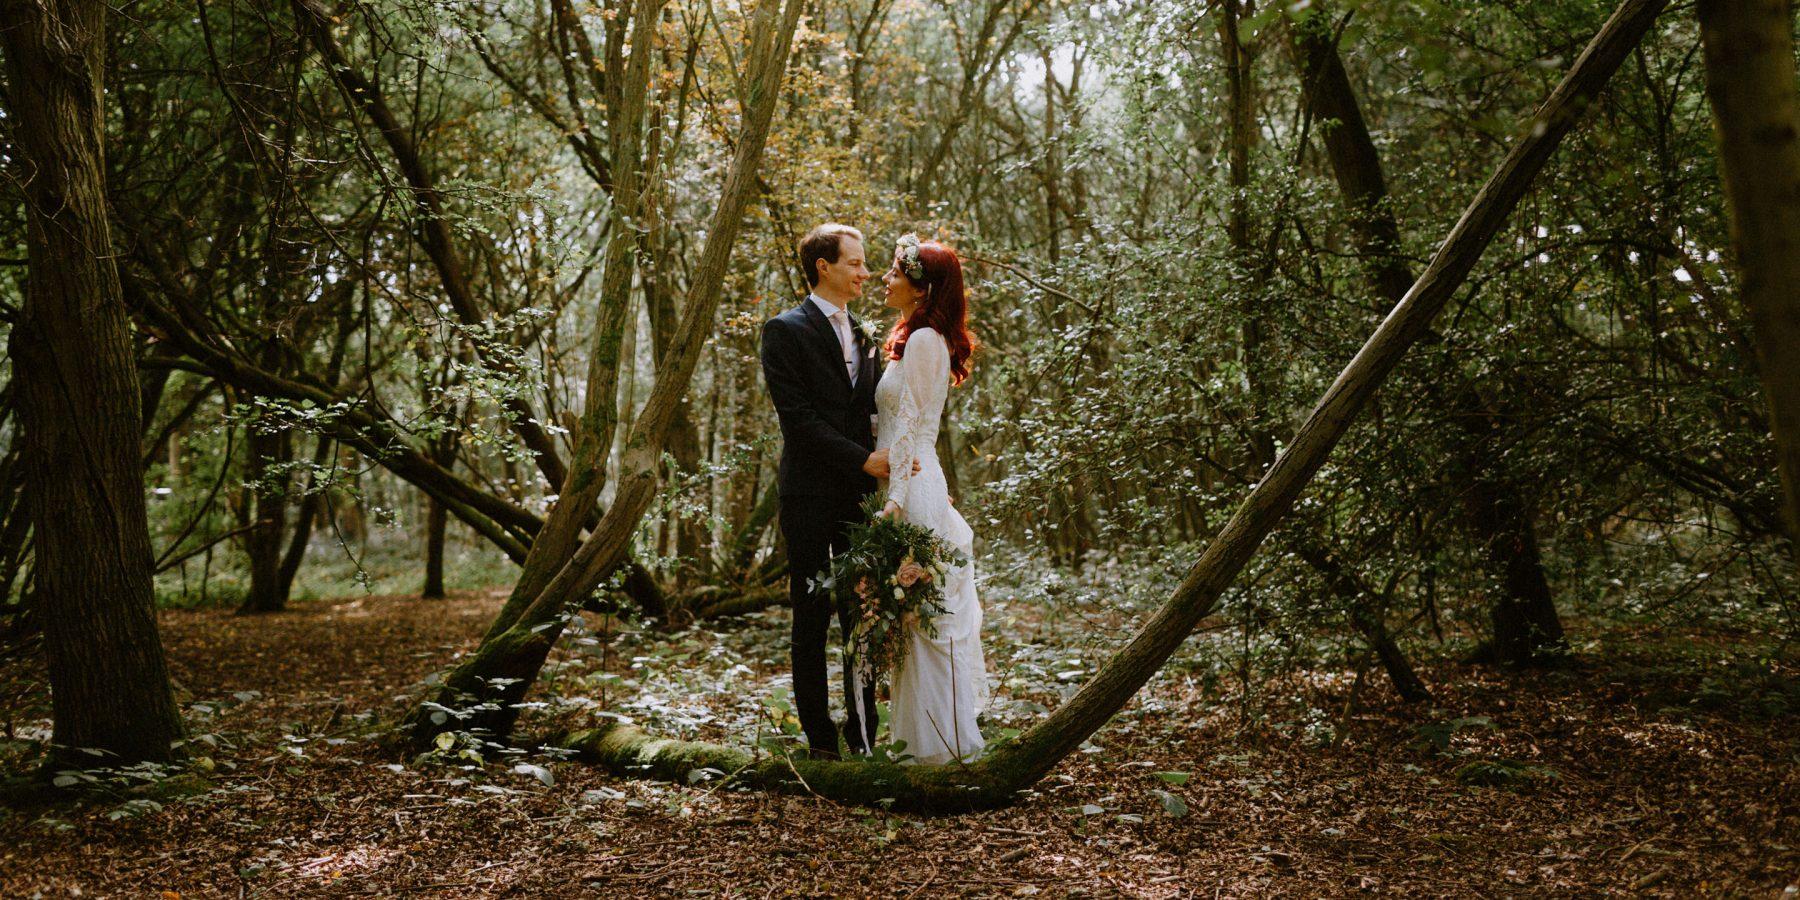 Essex Wedding Photographer Woodland wedding couple